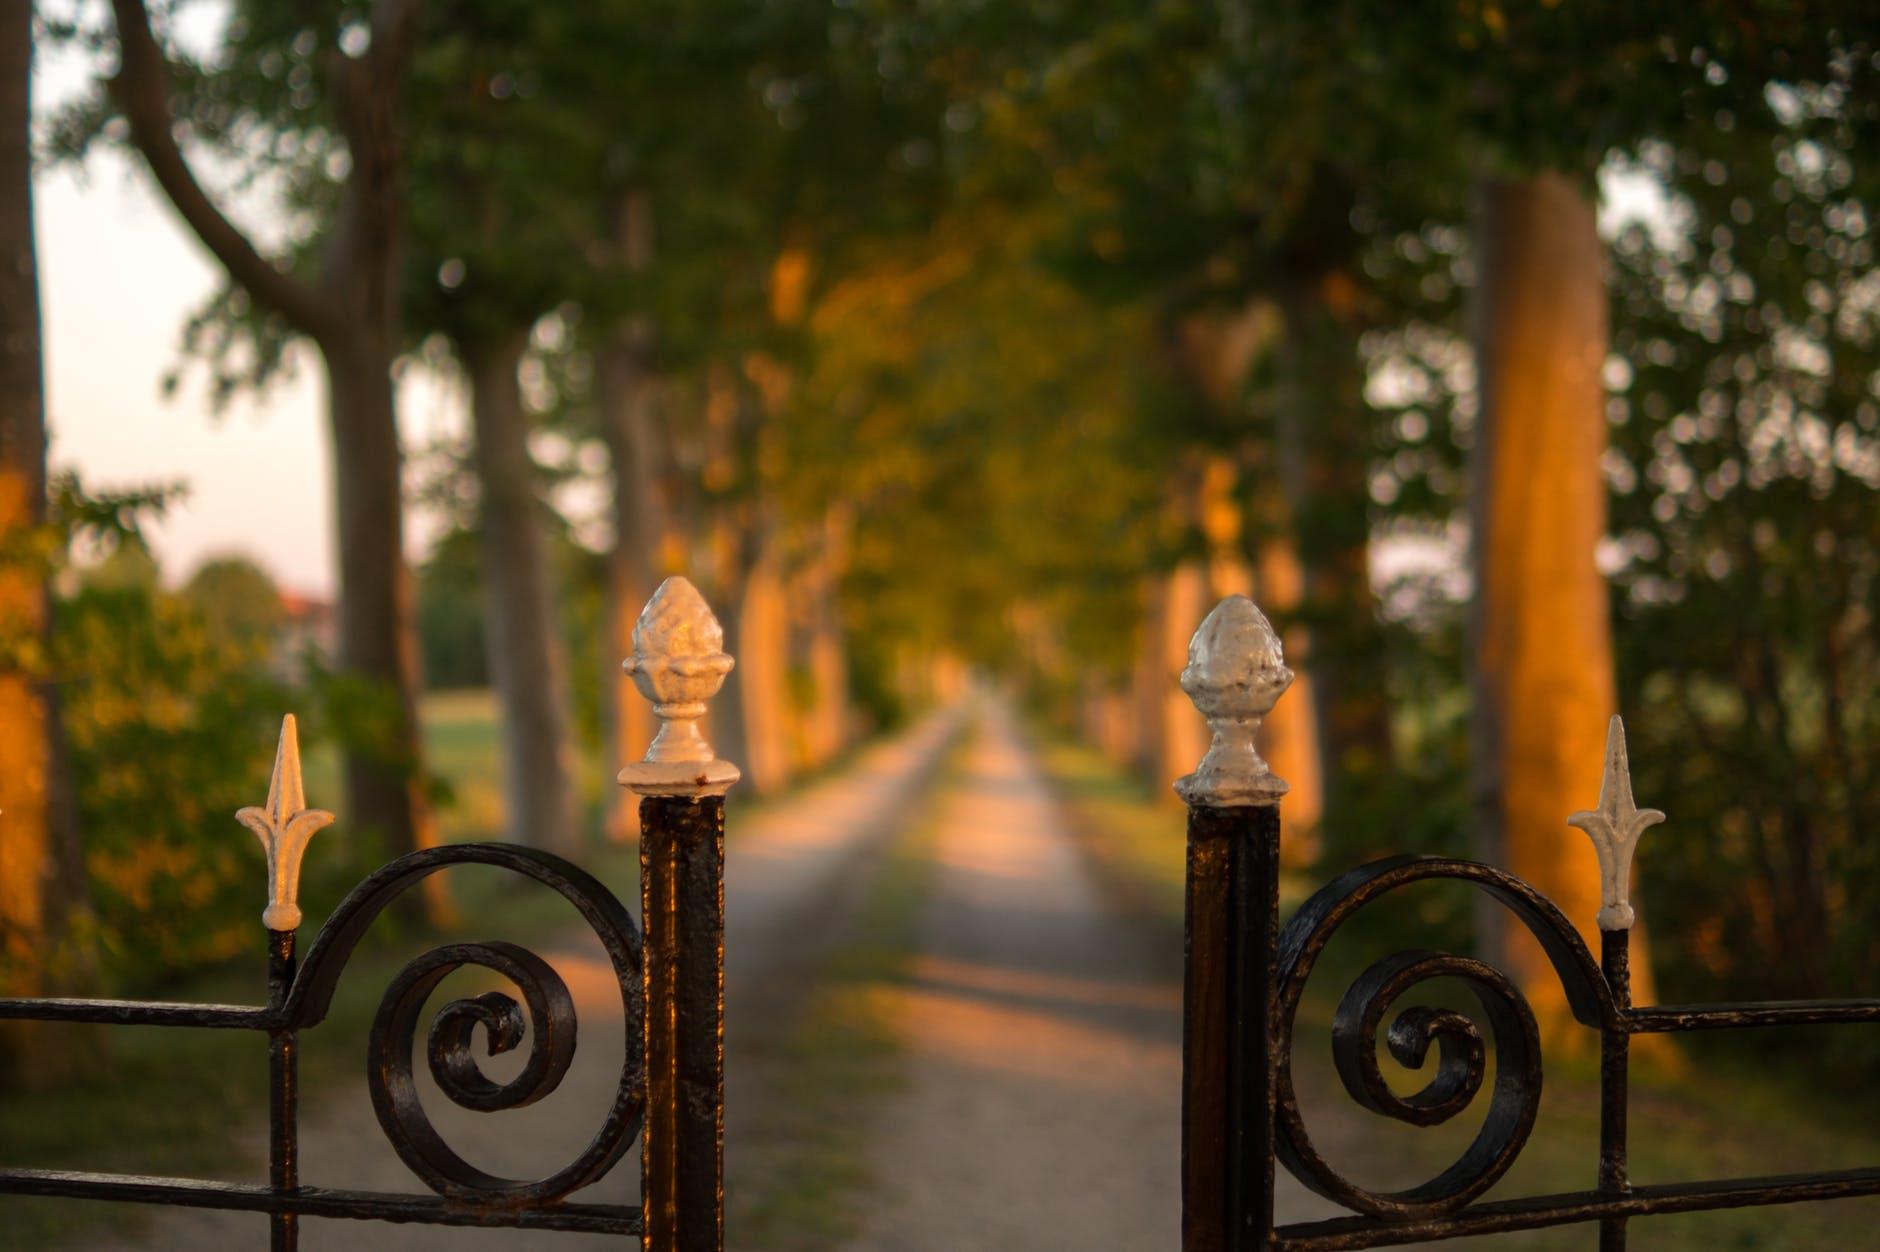 road-travel-fence-empty-10678.jpg